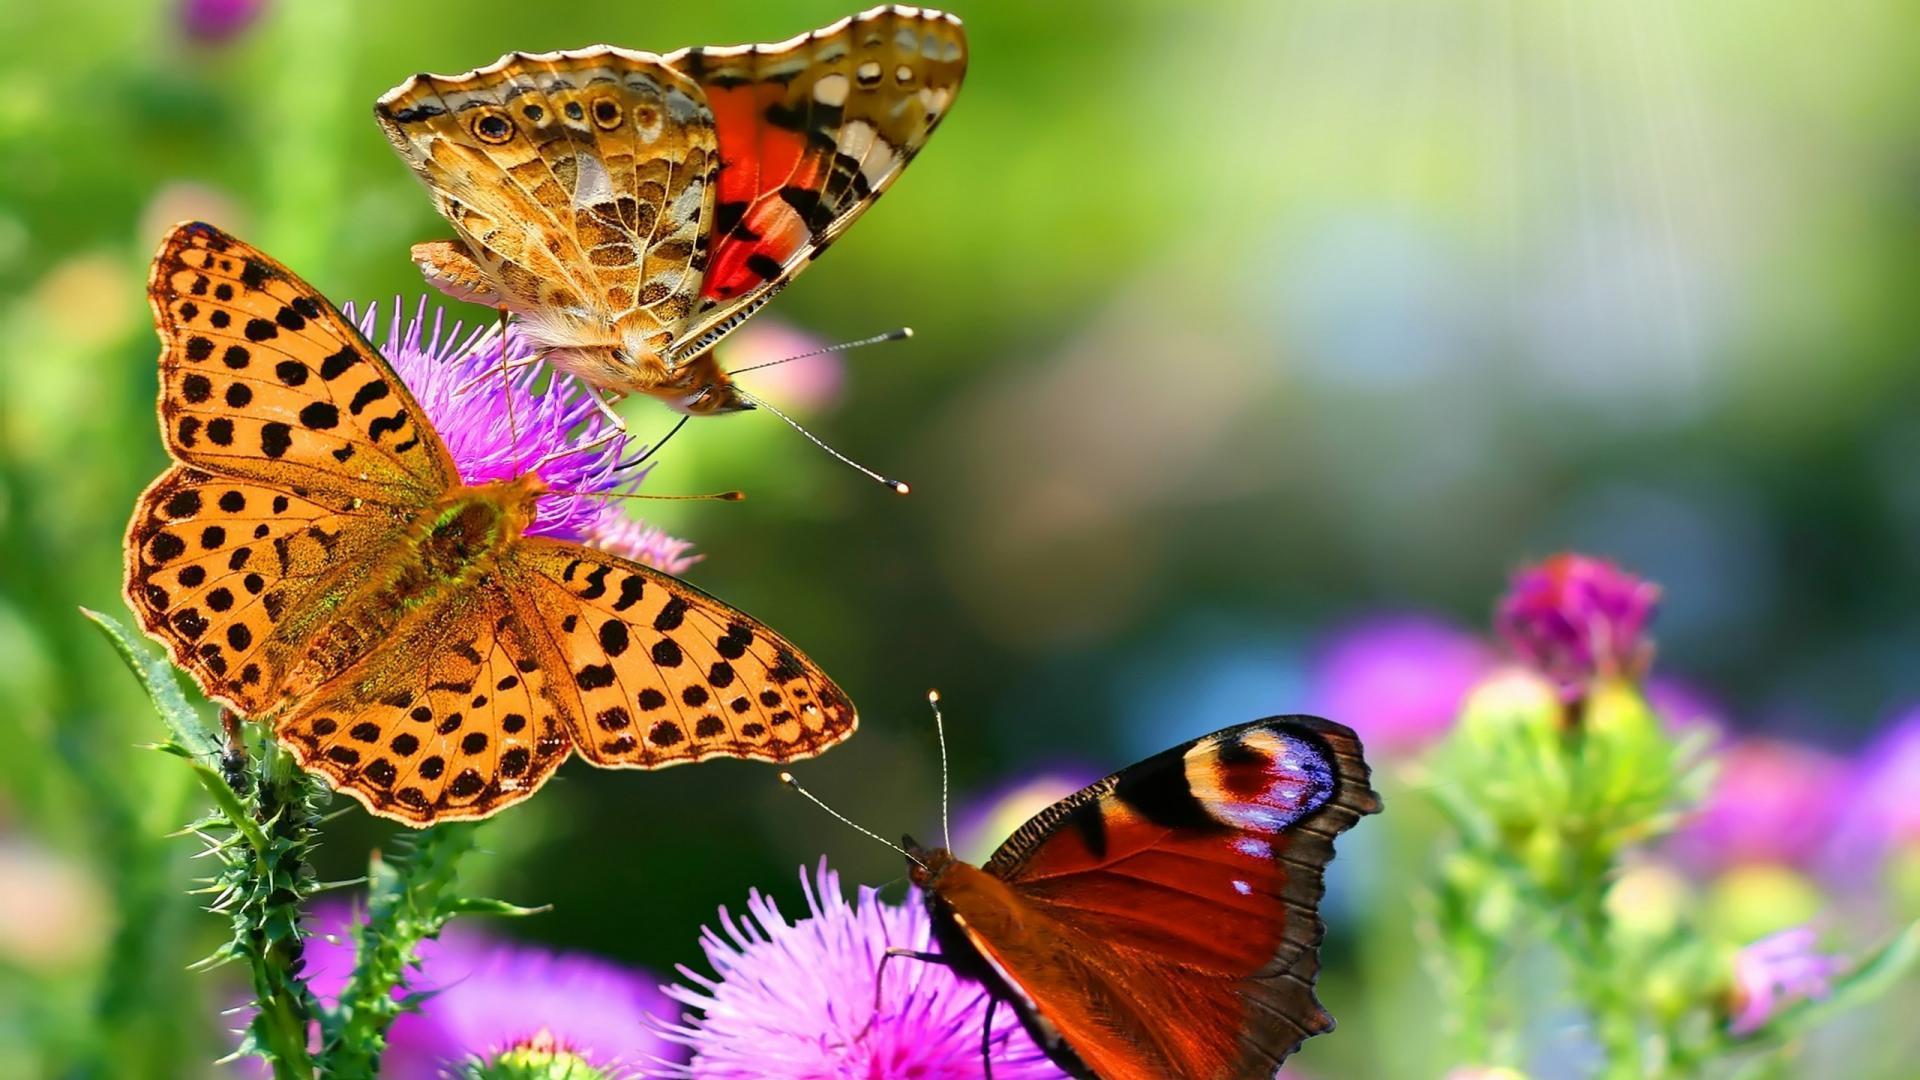 Three Beautiful Butterflies - HD Wallpapers